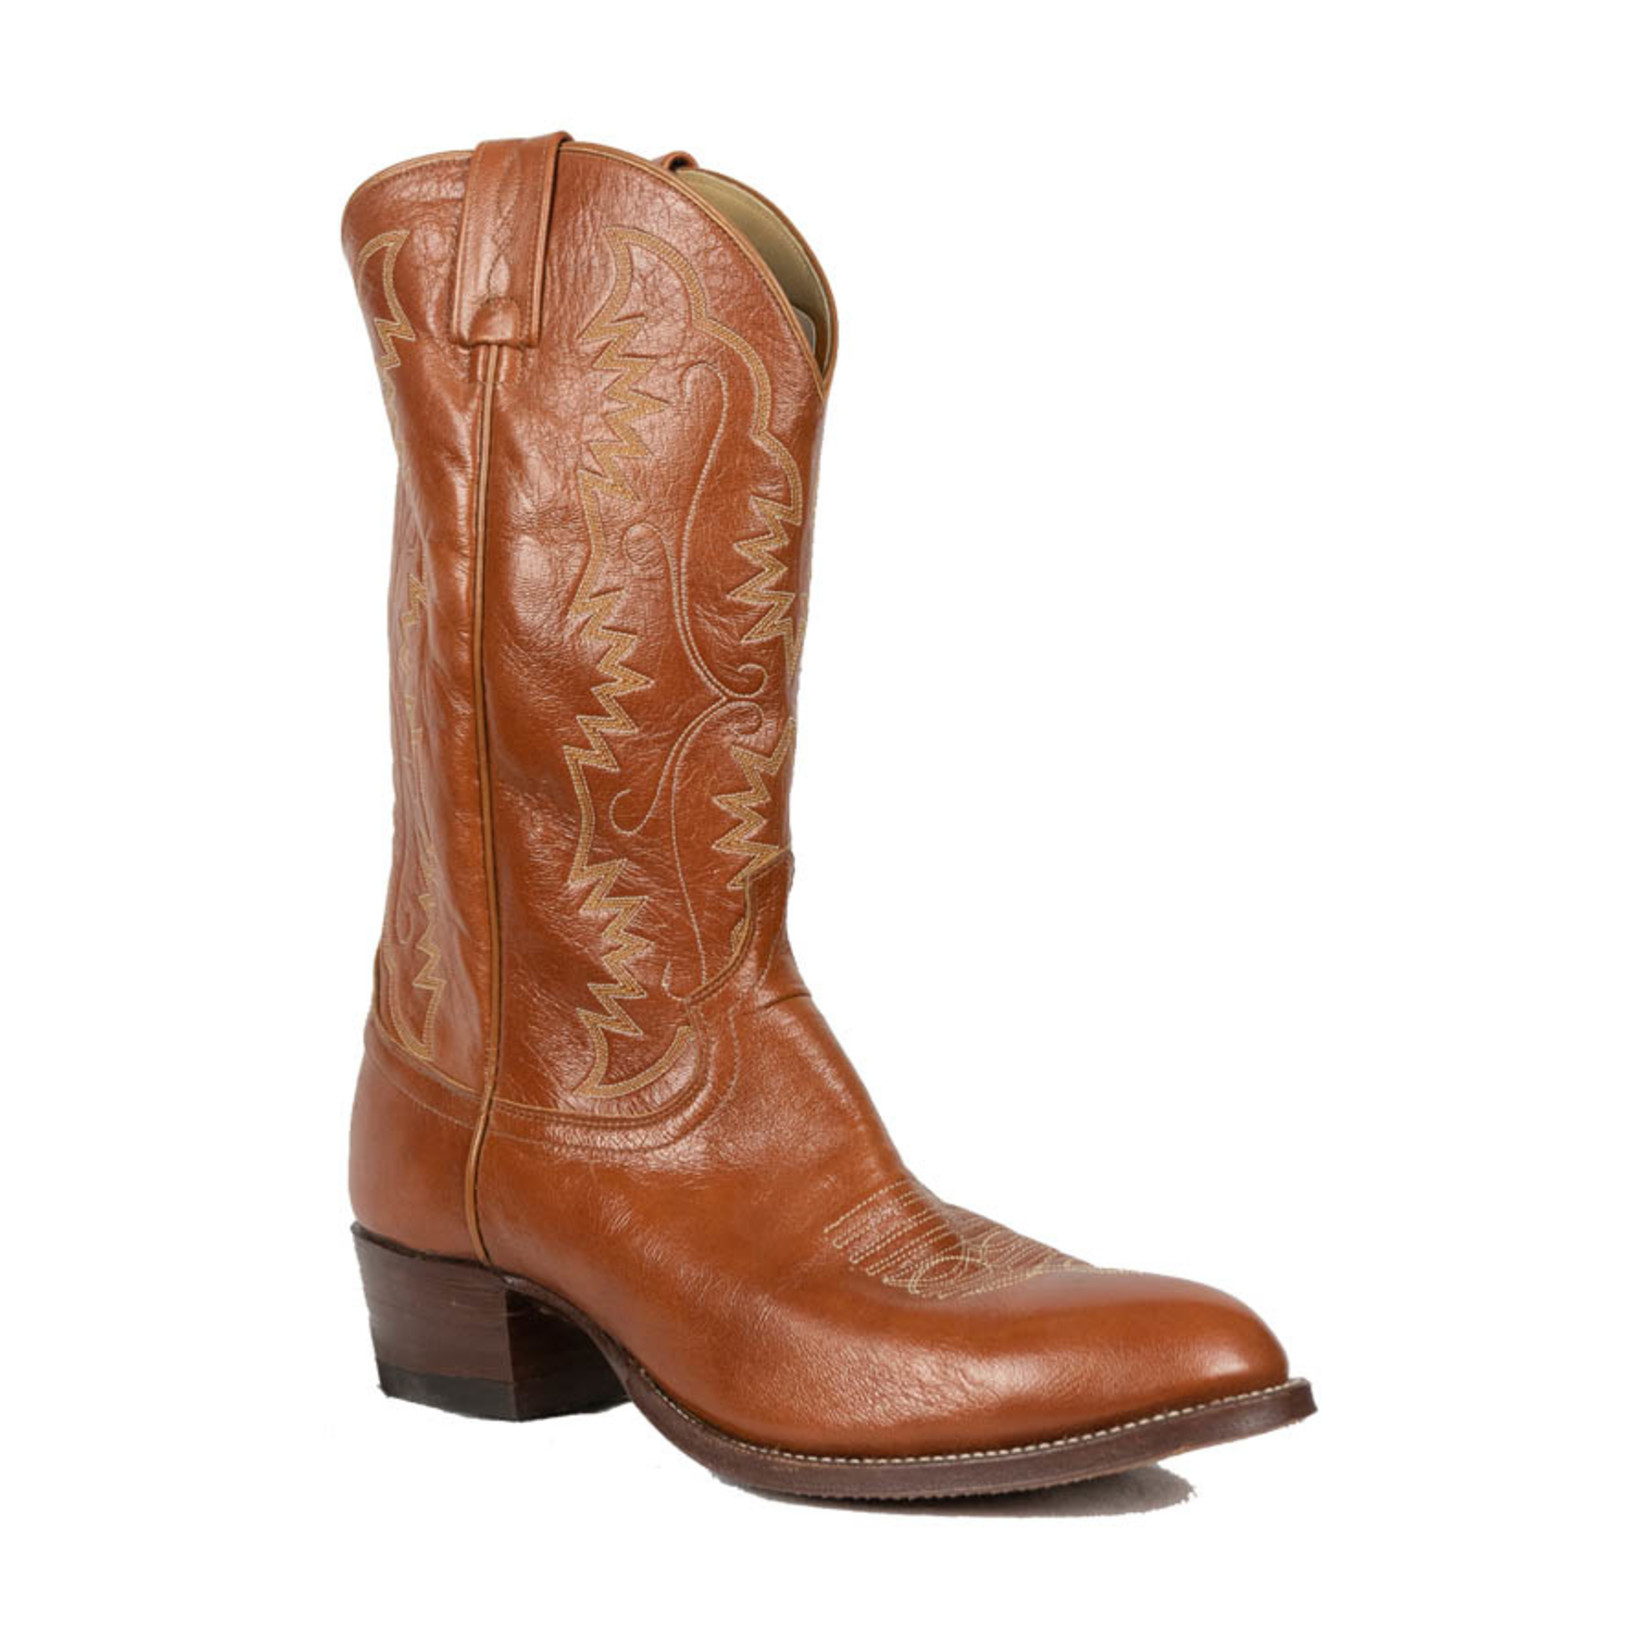 Dan Post by Canada West Men's Cowboy Boot  8008 3E